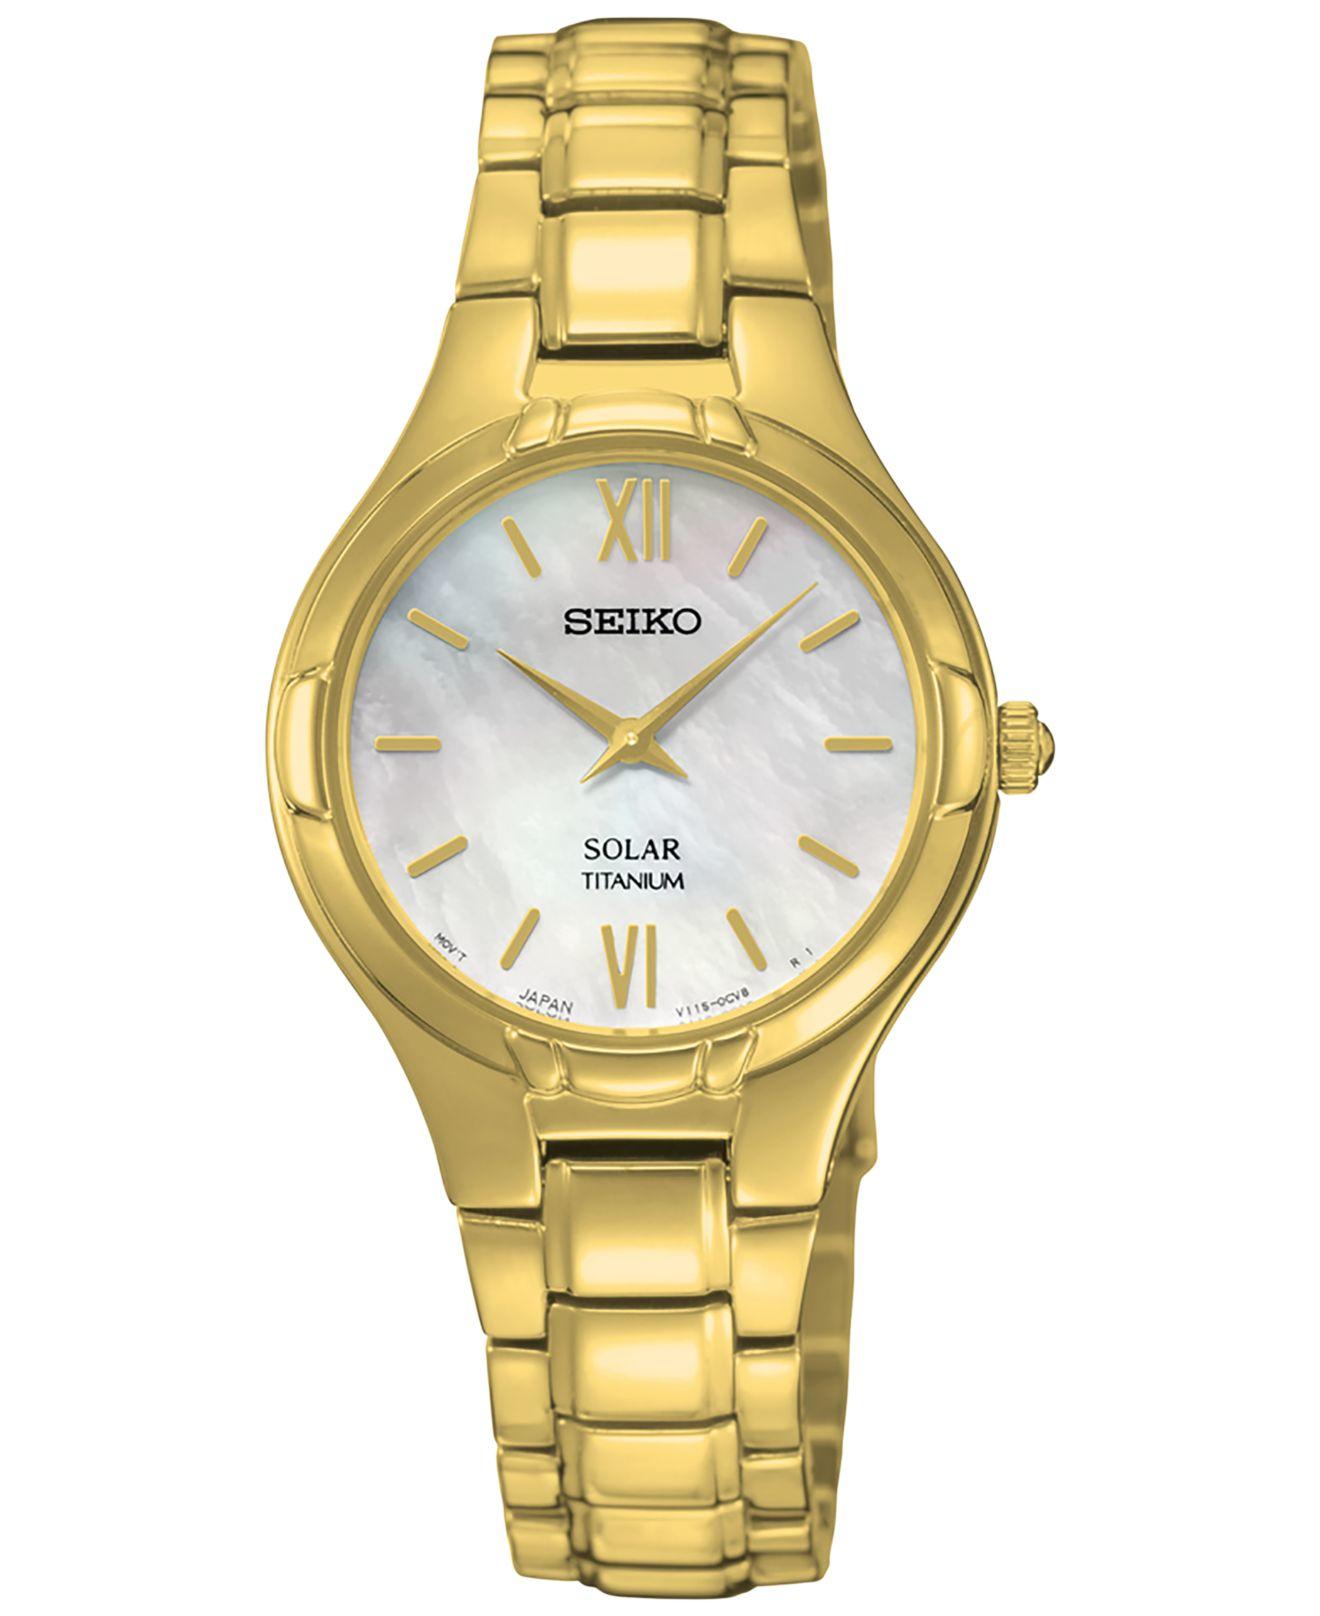 Seiko Women S Solar Gold Tone Titanium Bracelet Watch 28mm Sup294 In Metallic